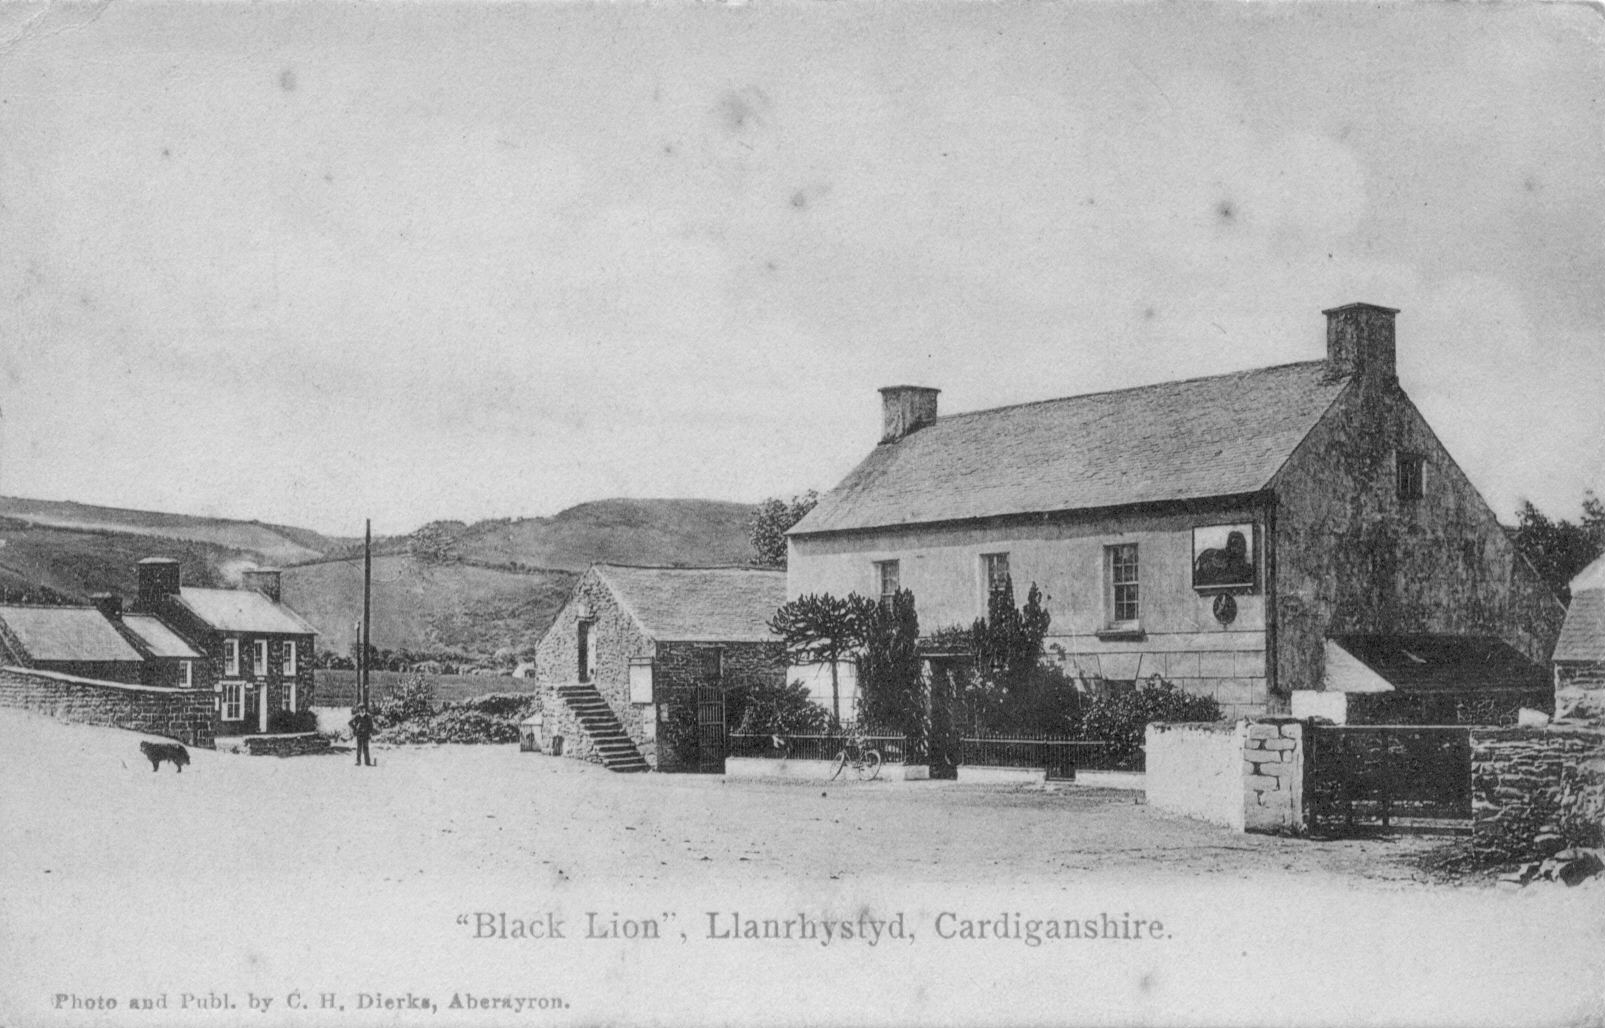 """Black Lion"", Llanrhystyd, Cardiganshire. Photo and Published by C.H. Dierks, Aberayron."